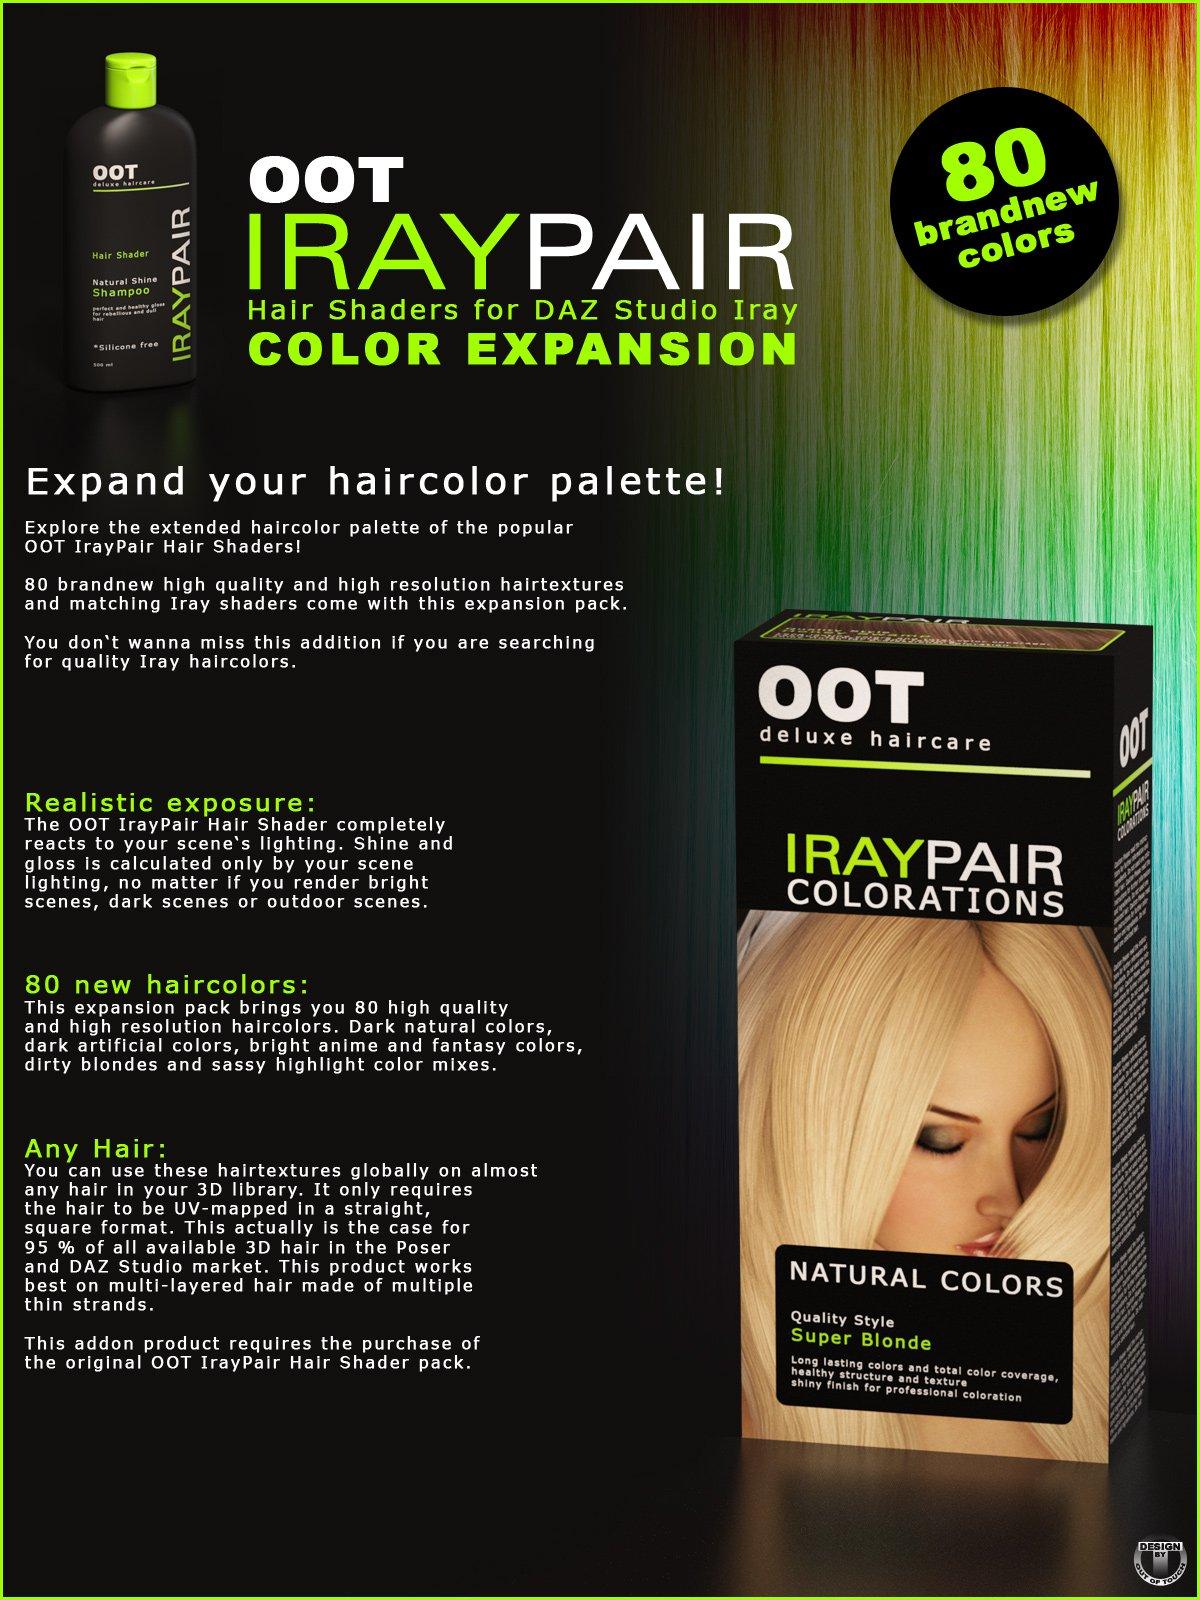 OOT IrayPair Hair Shader XPansion for DAZ Studio Iray_DAZ3D下载站